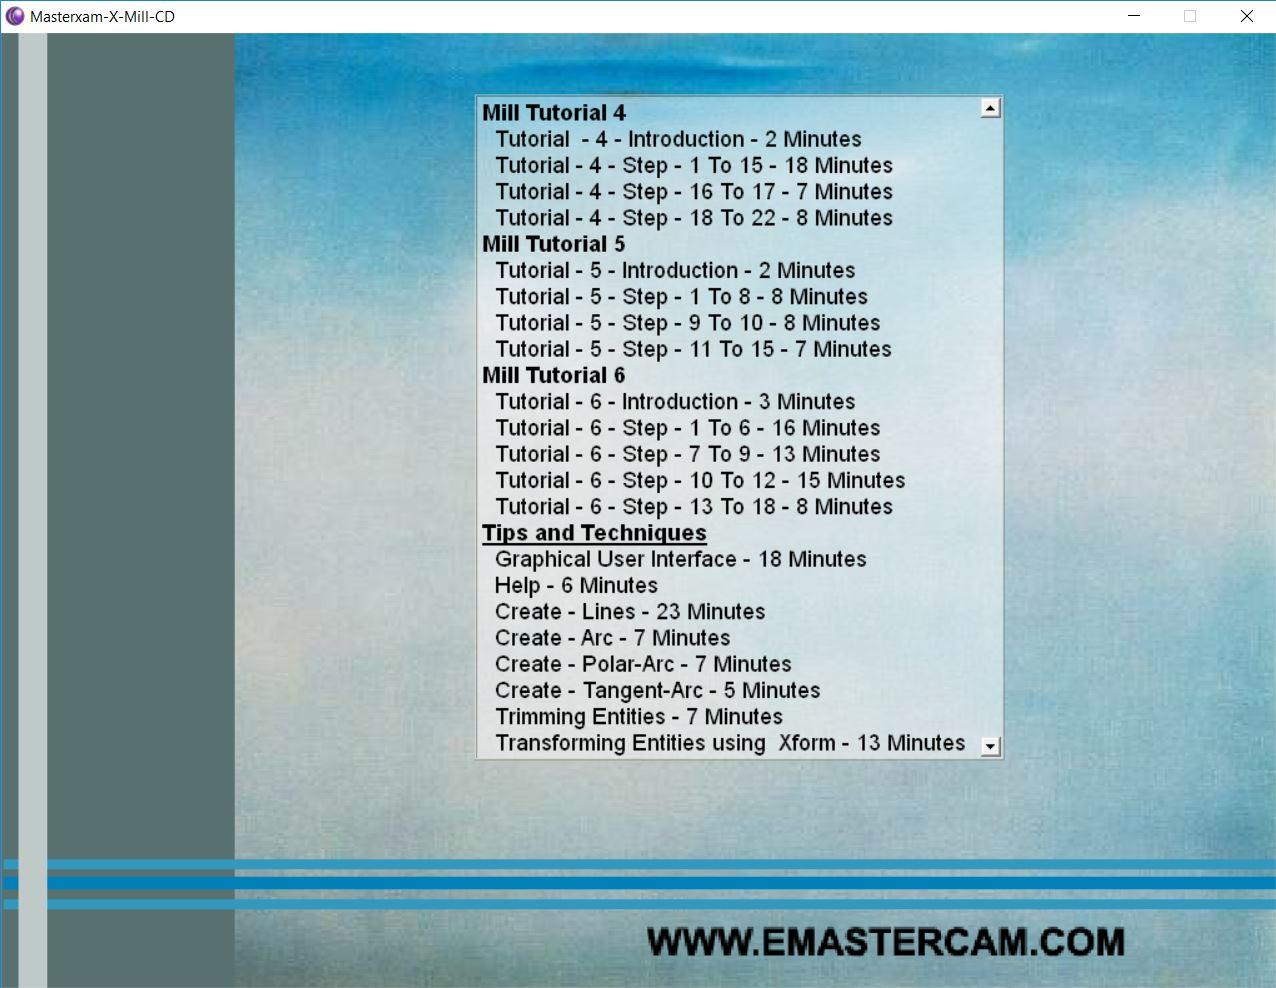 Mastercam X (10) video tutorials